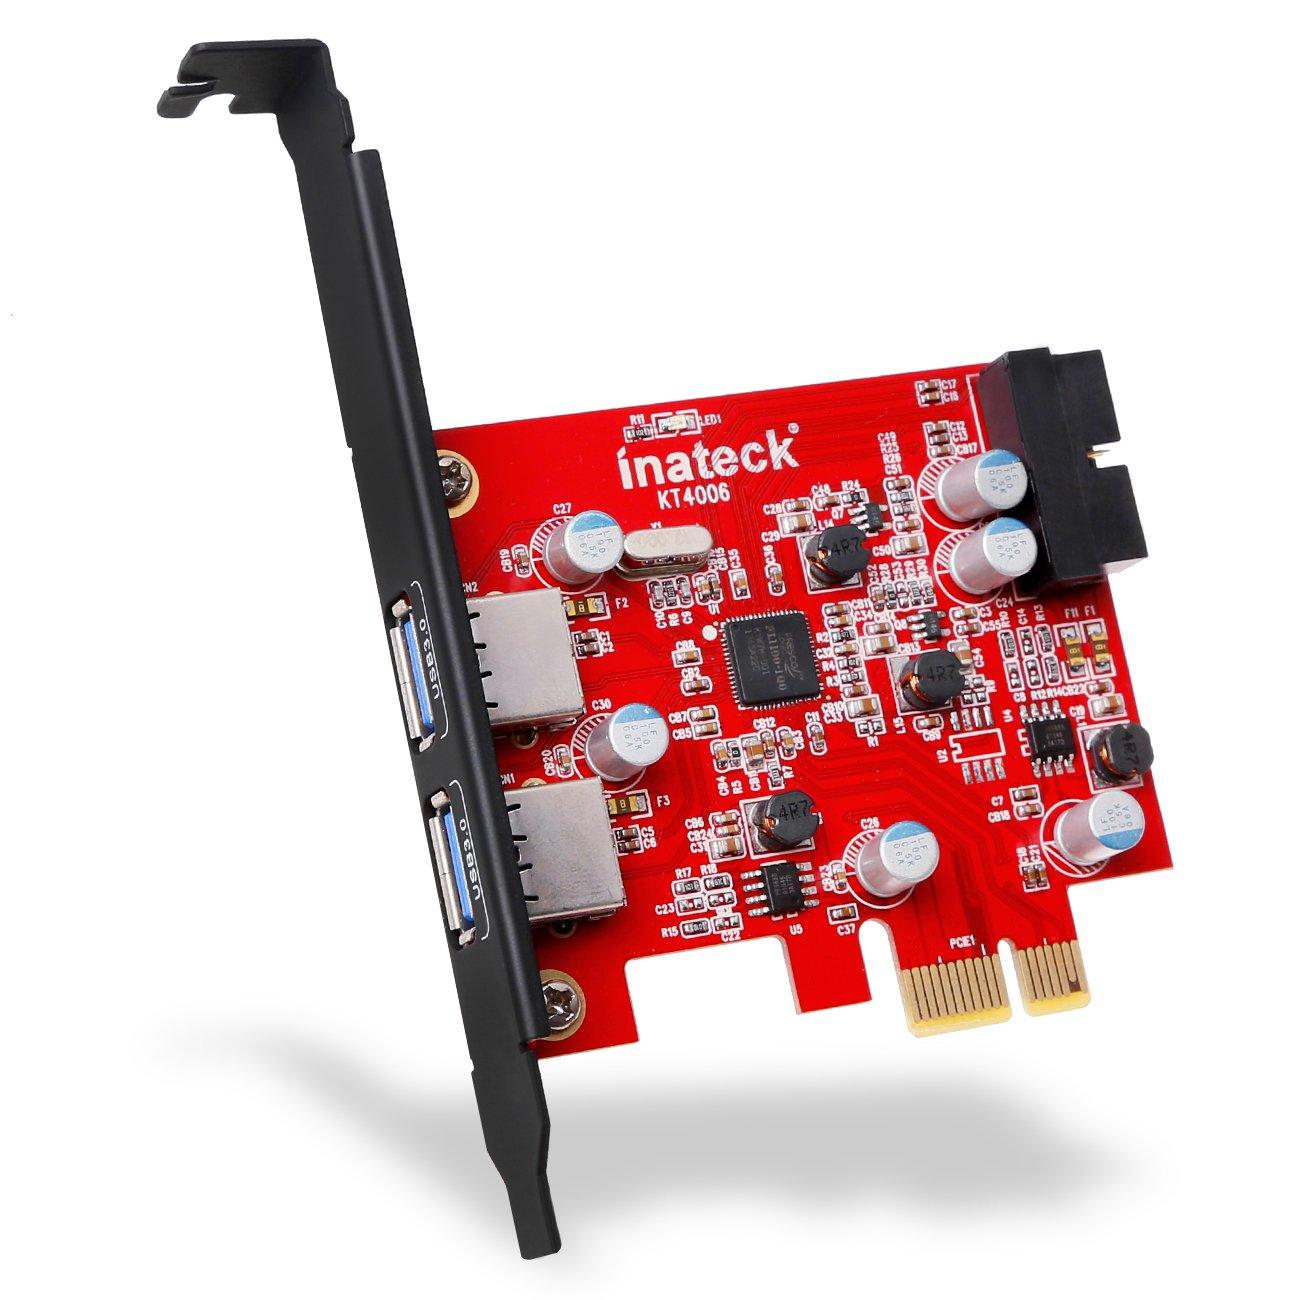 Tarjeta Inateck Pci-e Usb 3.0 Express De 2 Puertos, Mini Pci-e Adaptador De Controlador De Concentrador Usb 3.0 Con Cone